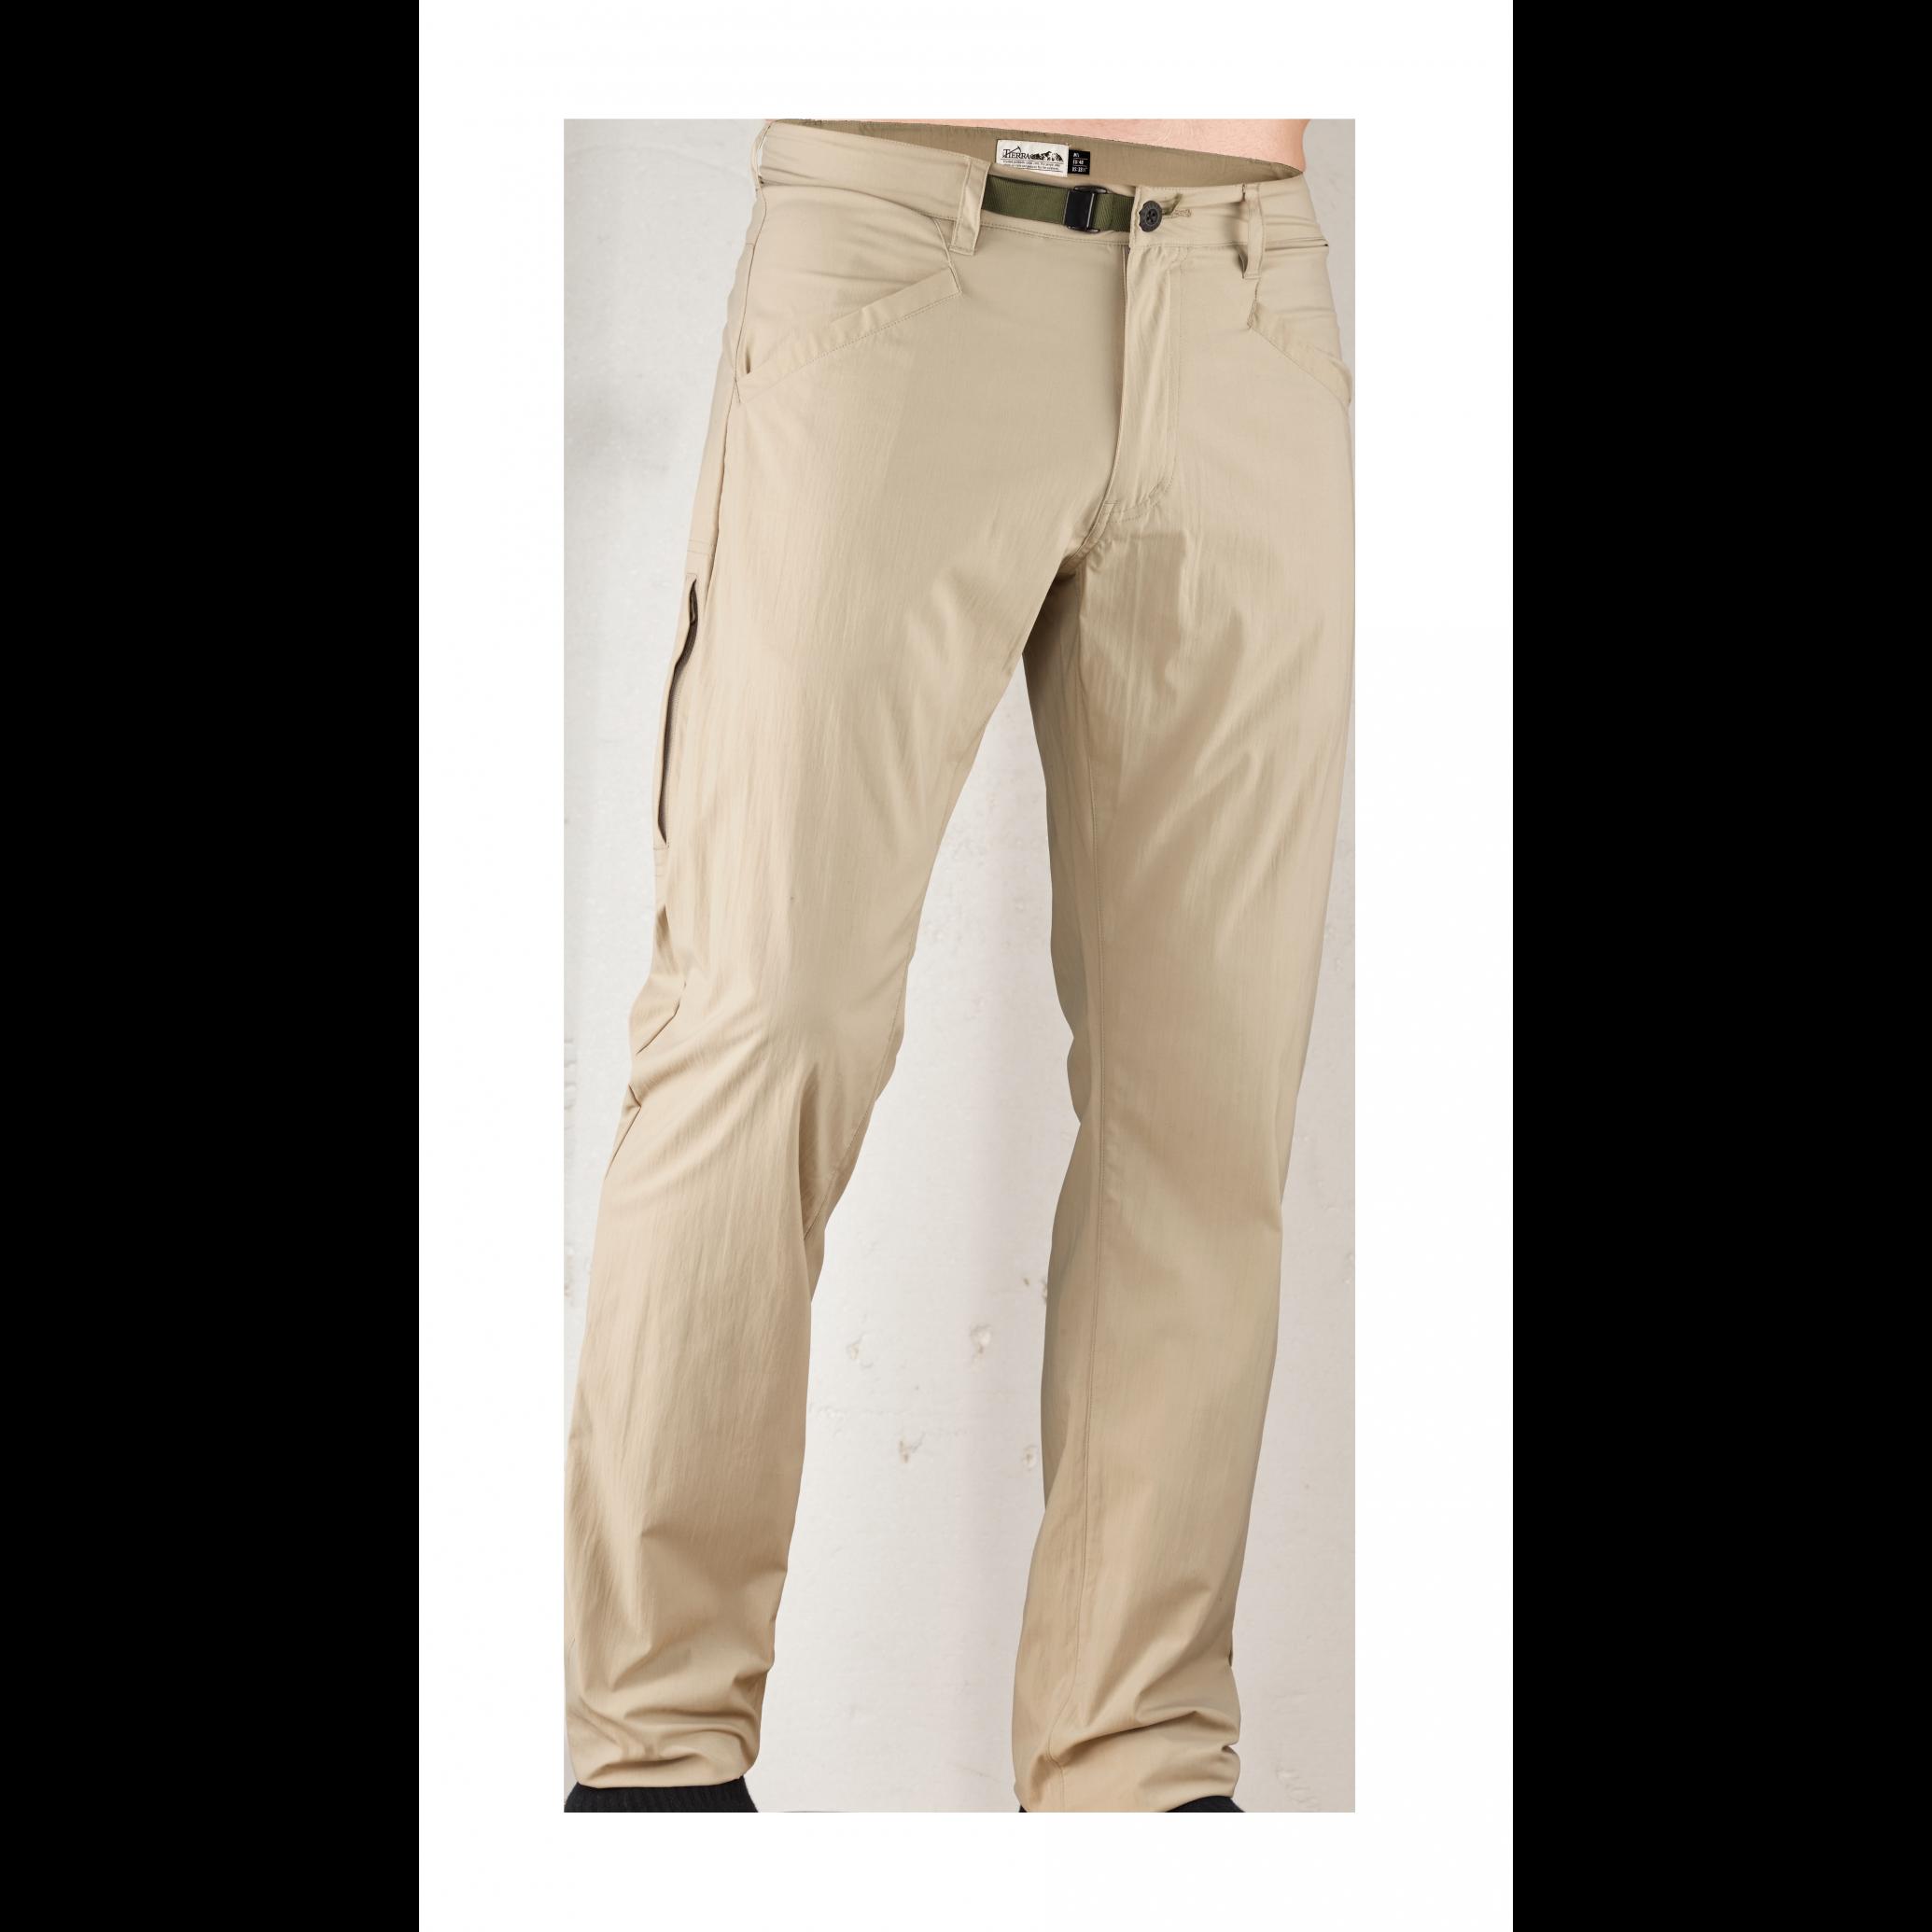 Khaki Pants PNG - 43428